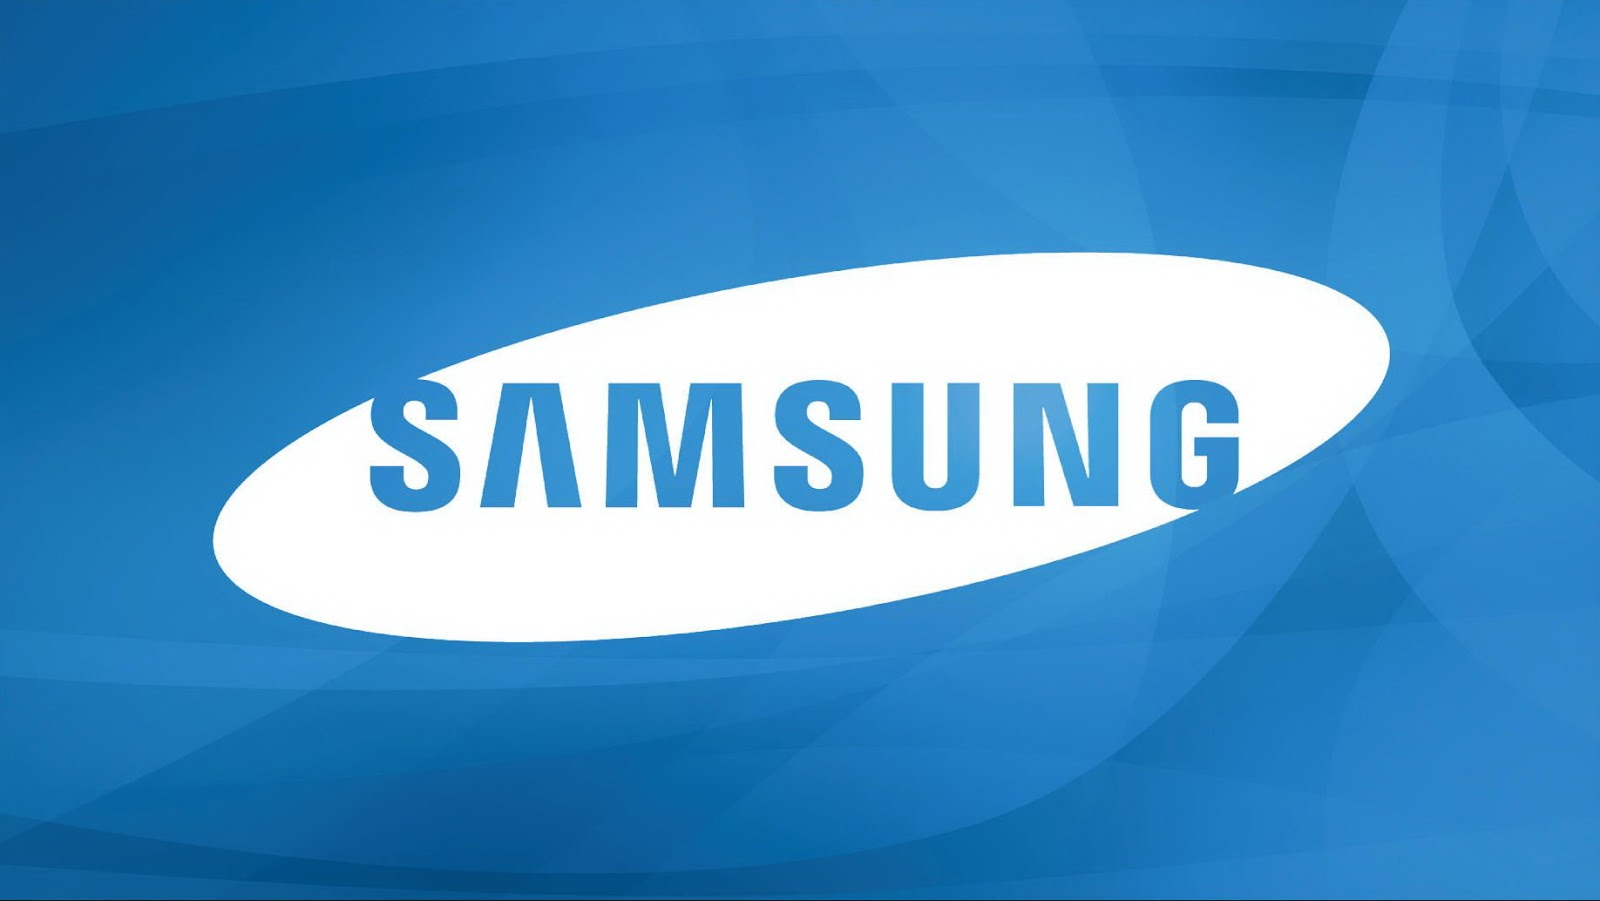 Samsung Logo Wallpapers: Wallpaper: Wallpapers 4 Samsung